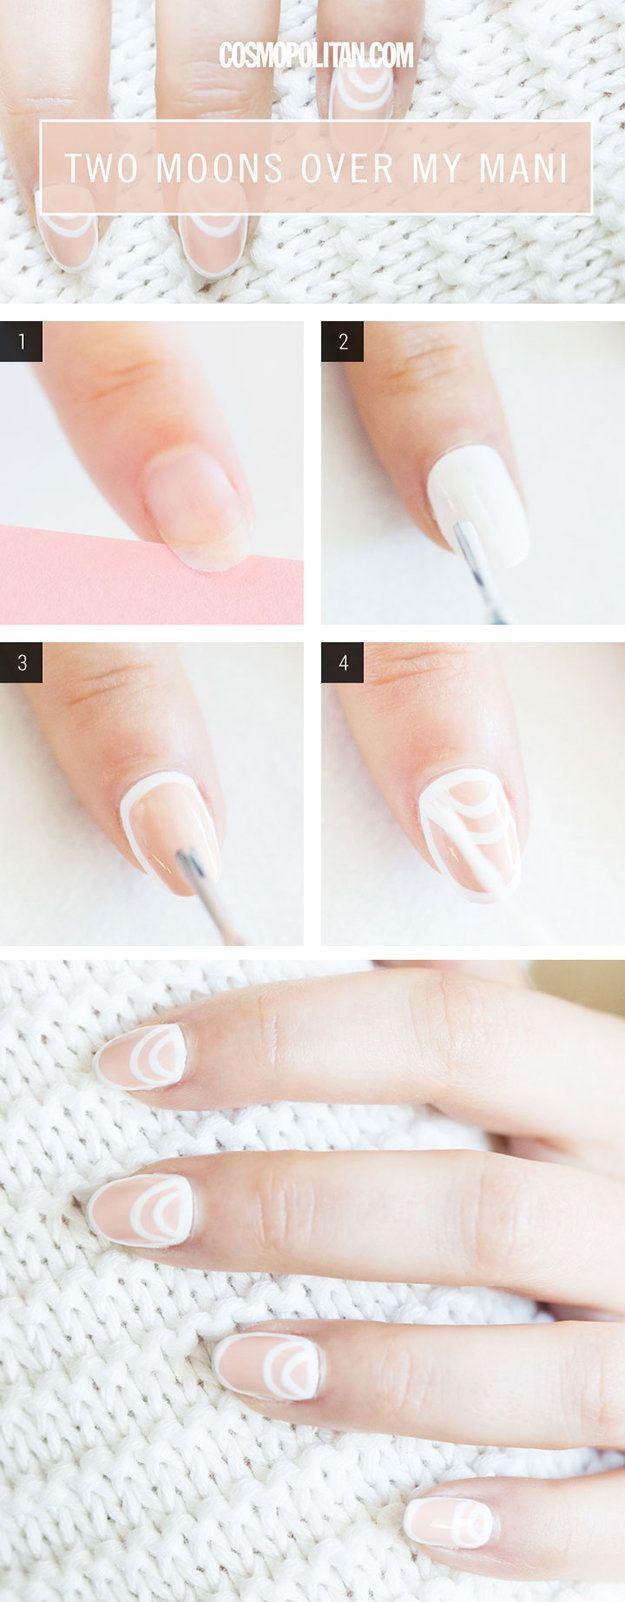 201 best Vintage Nail Art images on Pinterest | Vintage nail art ...